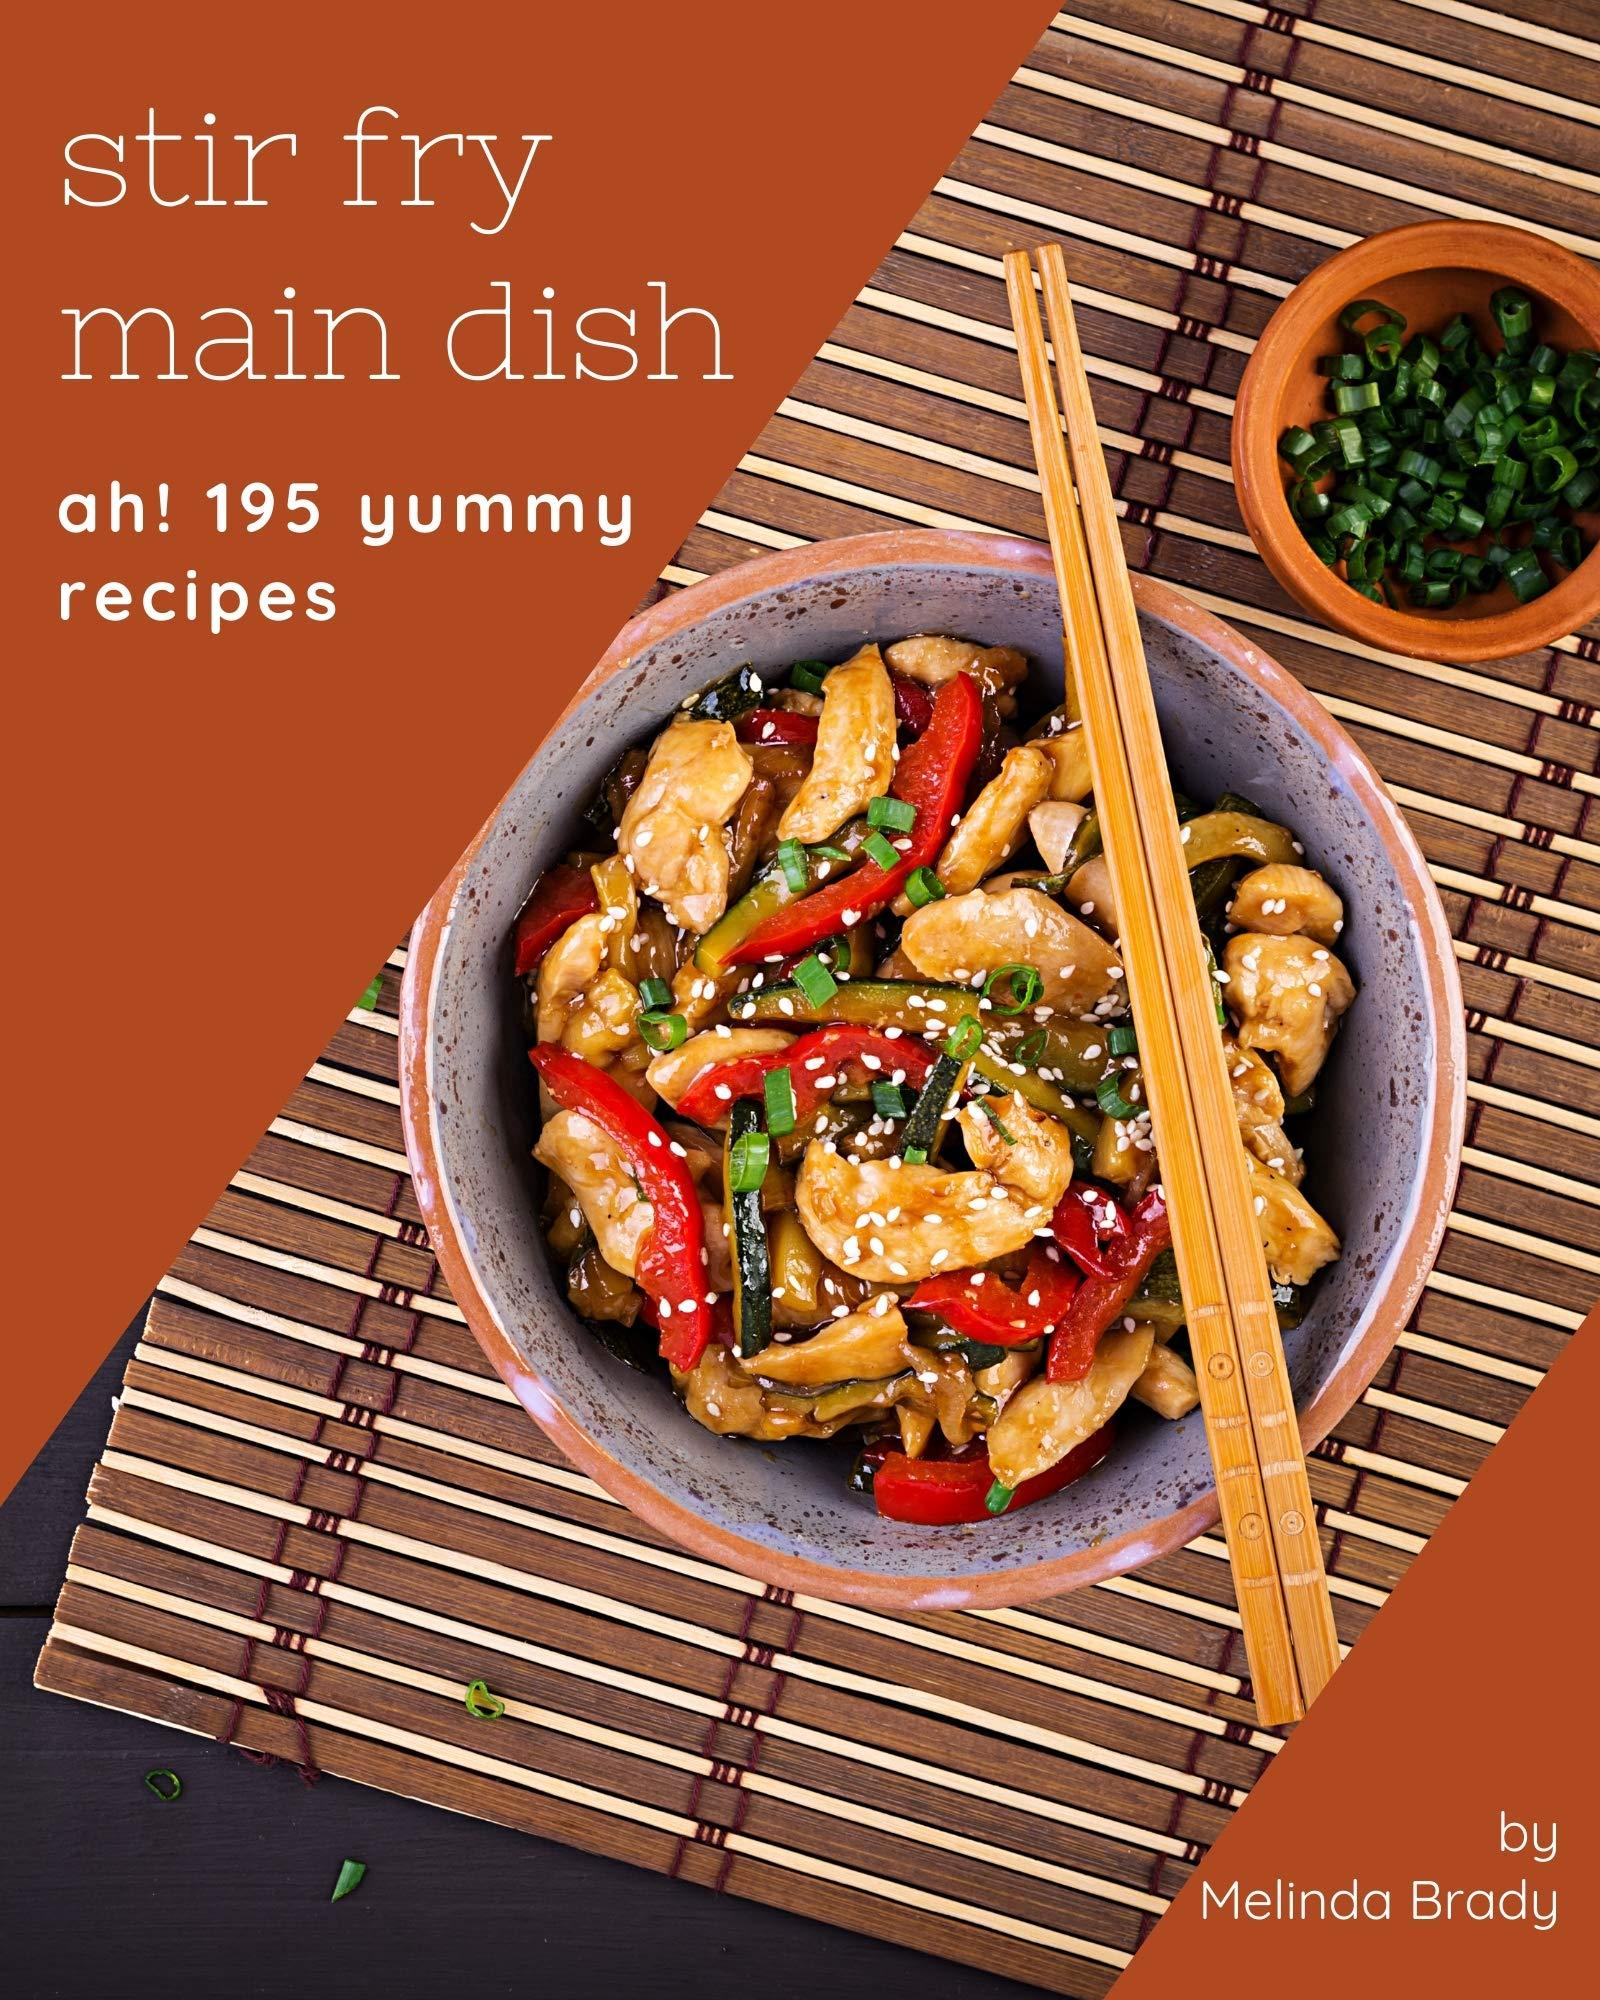 Ah! 195 Yummy Stir Fry Main Dish Recipes: A Yummy Stir Fry Main Dish Cookbook You Won't be Able to Put Down